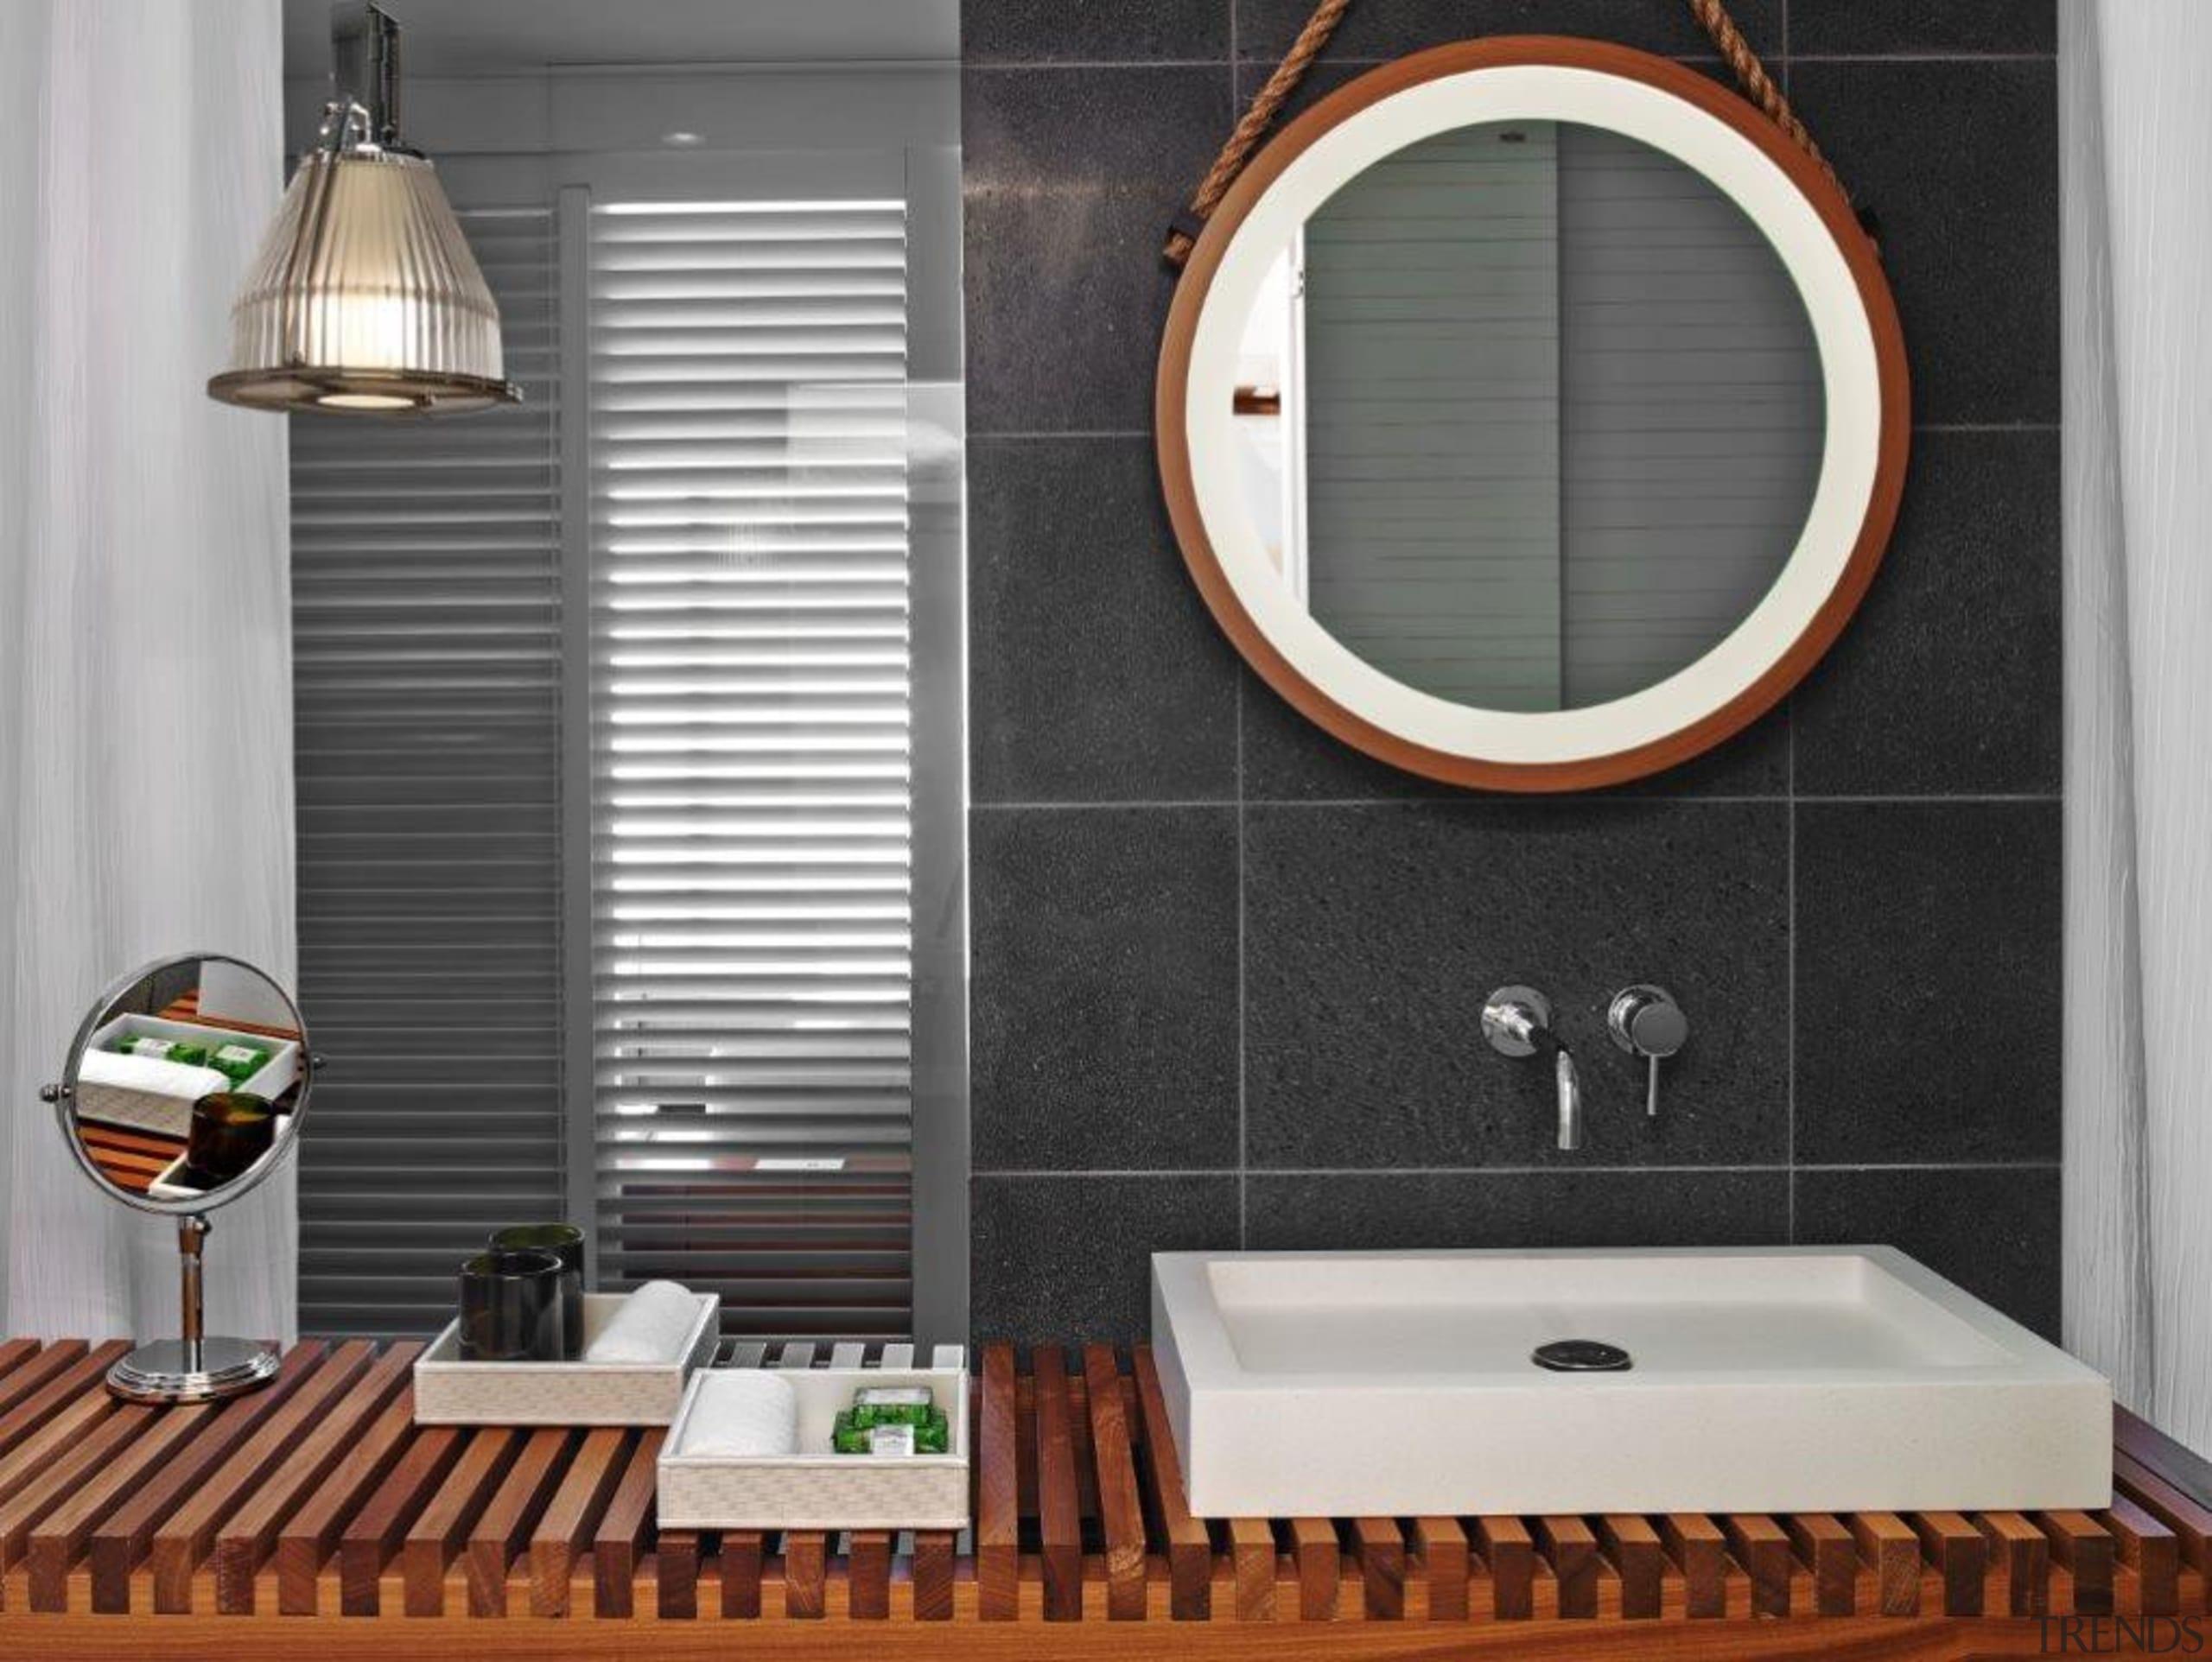 If you seek a perfect bathing experience, where bathroom, bathroom accessory, interior design, plumbing fixture, room, sink, tile, window, gray, black